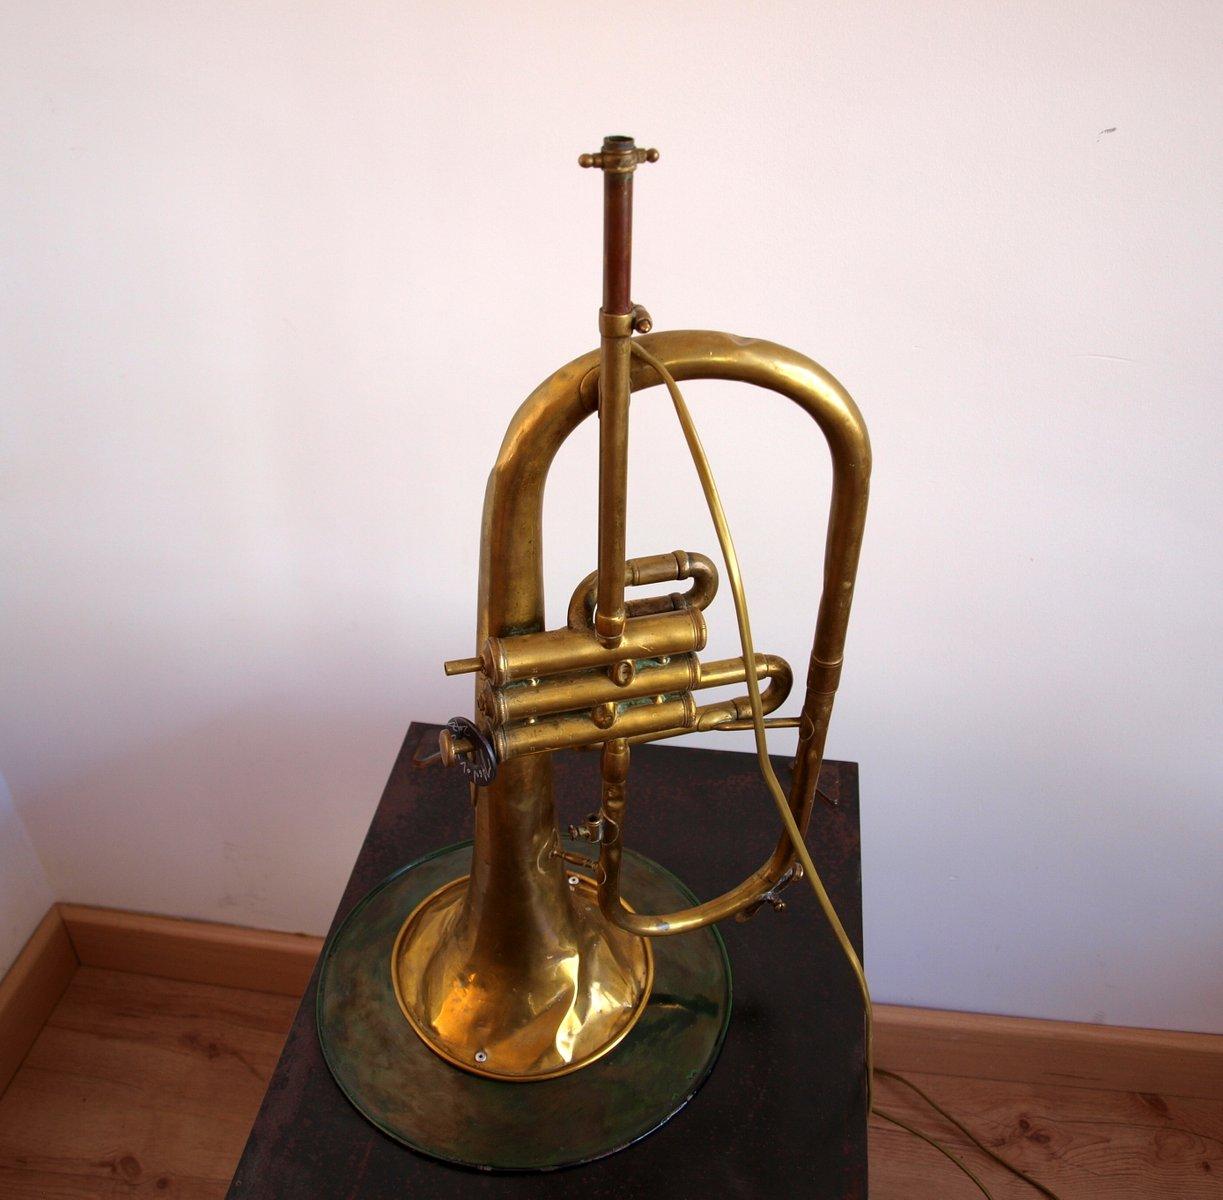 vintage trompete h ngelampe bei pamono kaufen. Black Bedroom Furniture Sets. Home Design Ideas